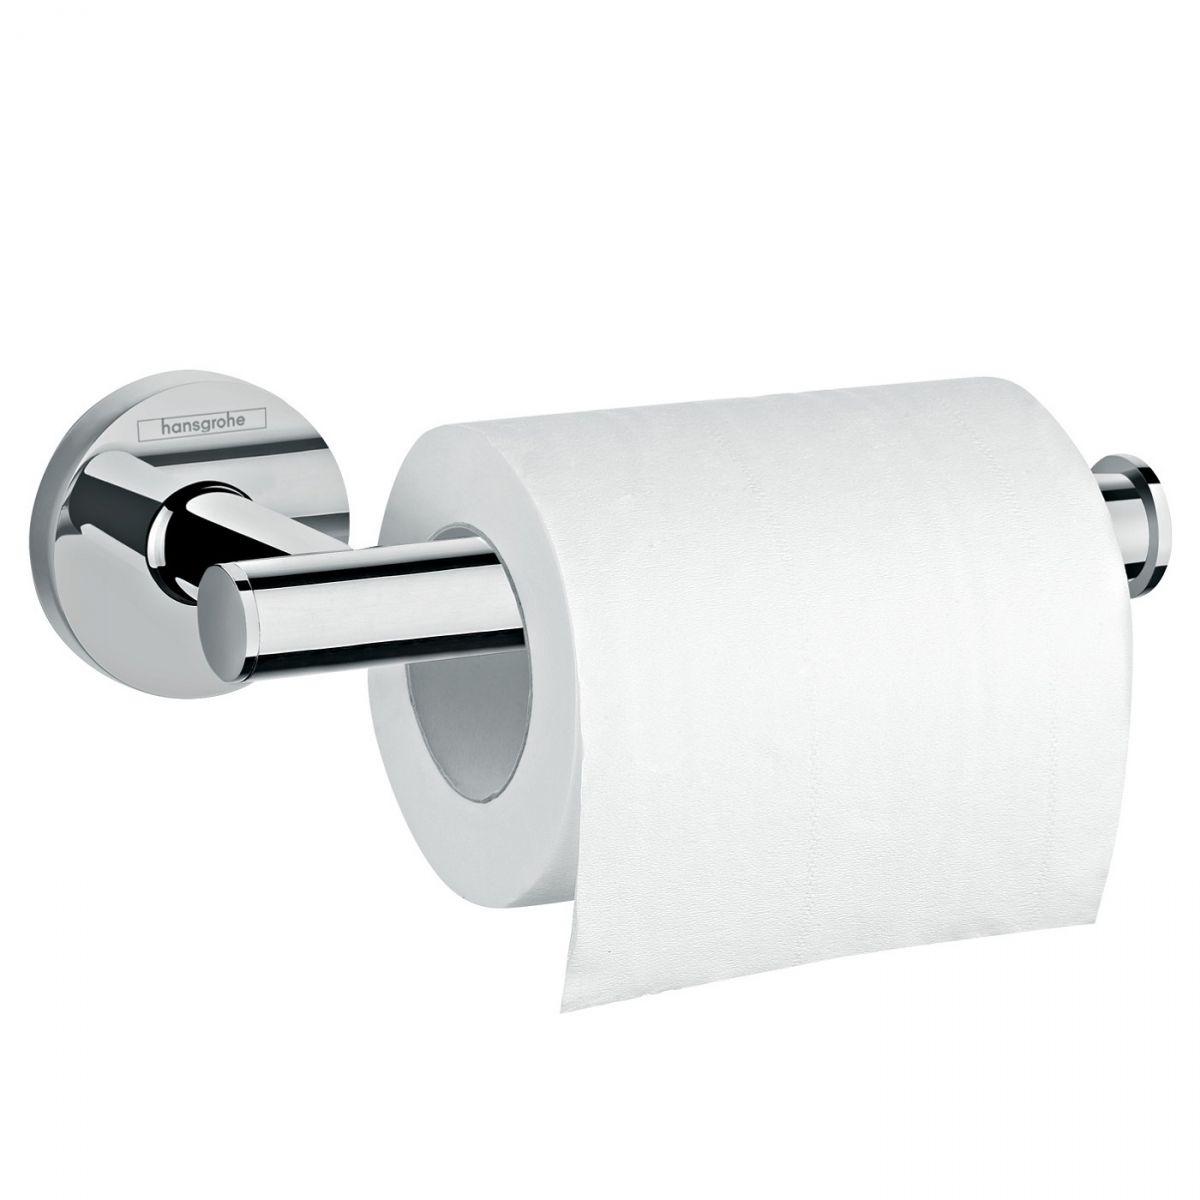 Hansgrohe Logis Universal Toilet Roll Holder Uk Bathrooms